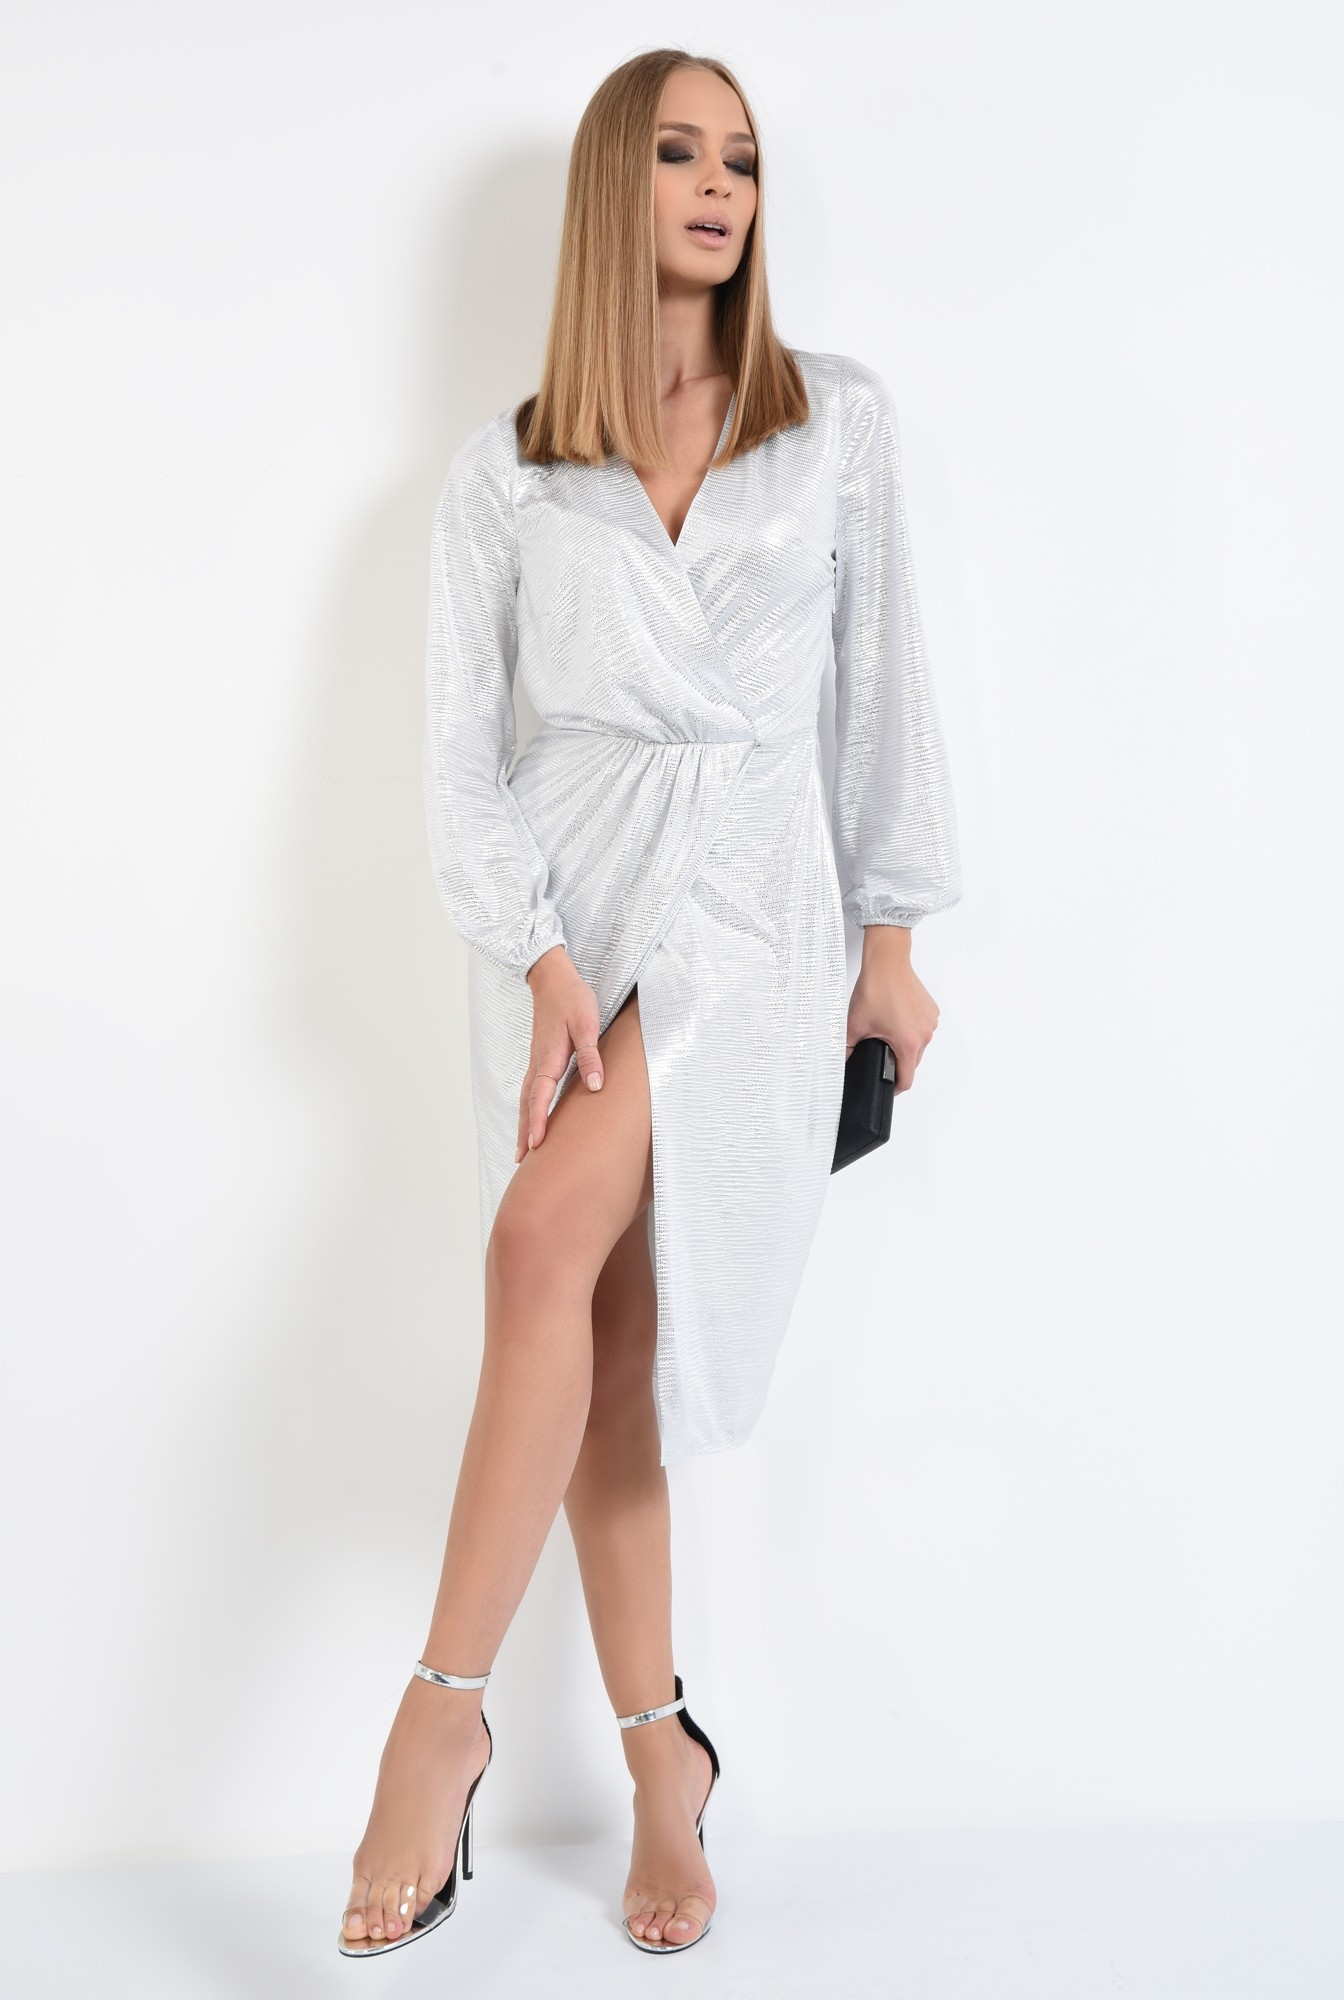 3 - rochie de seara, petrecuta, din lurex, argintie, drapata